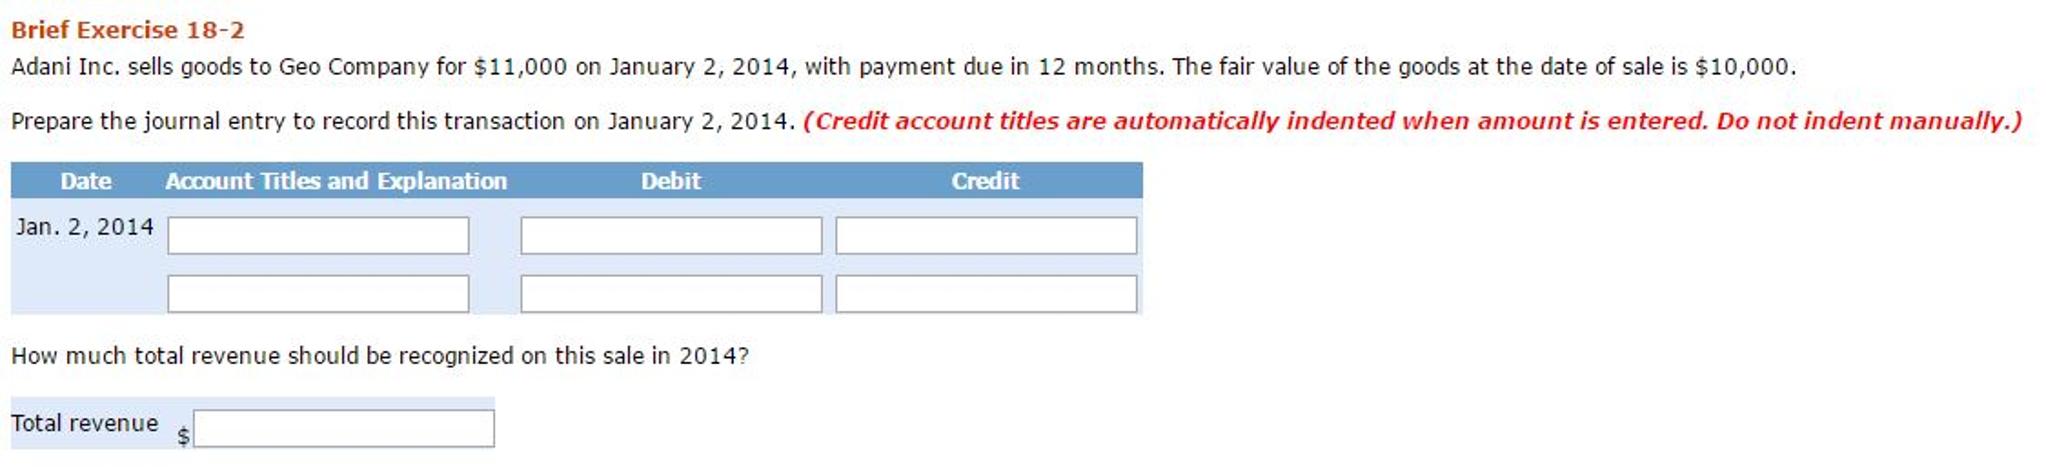 accounting archive november 06 2016 chegg com rh chegg com